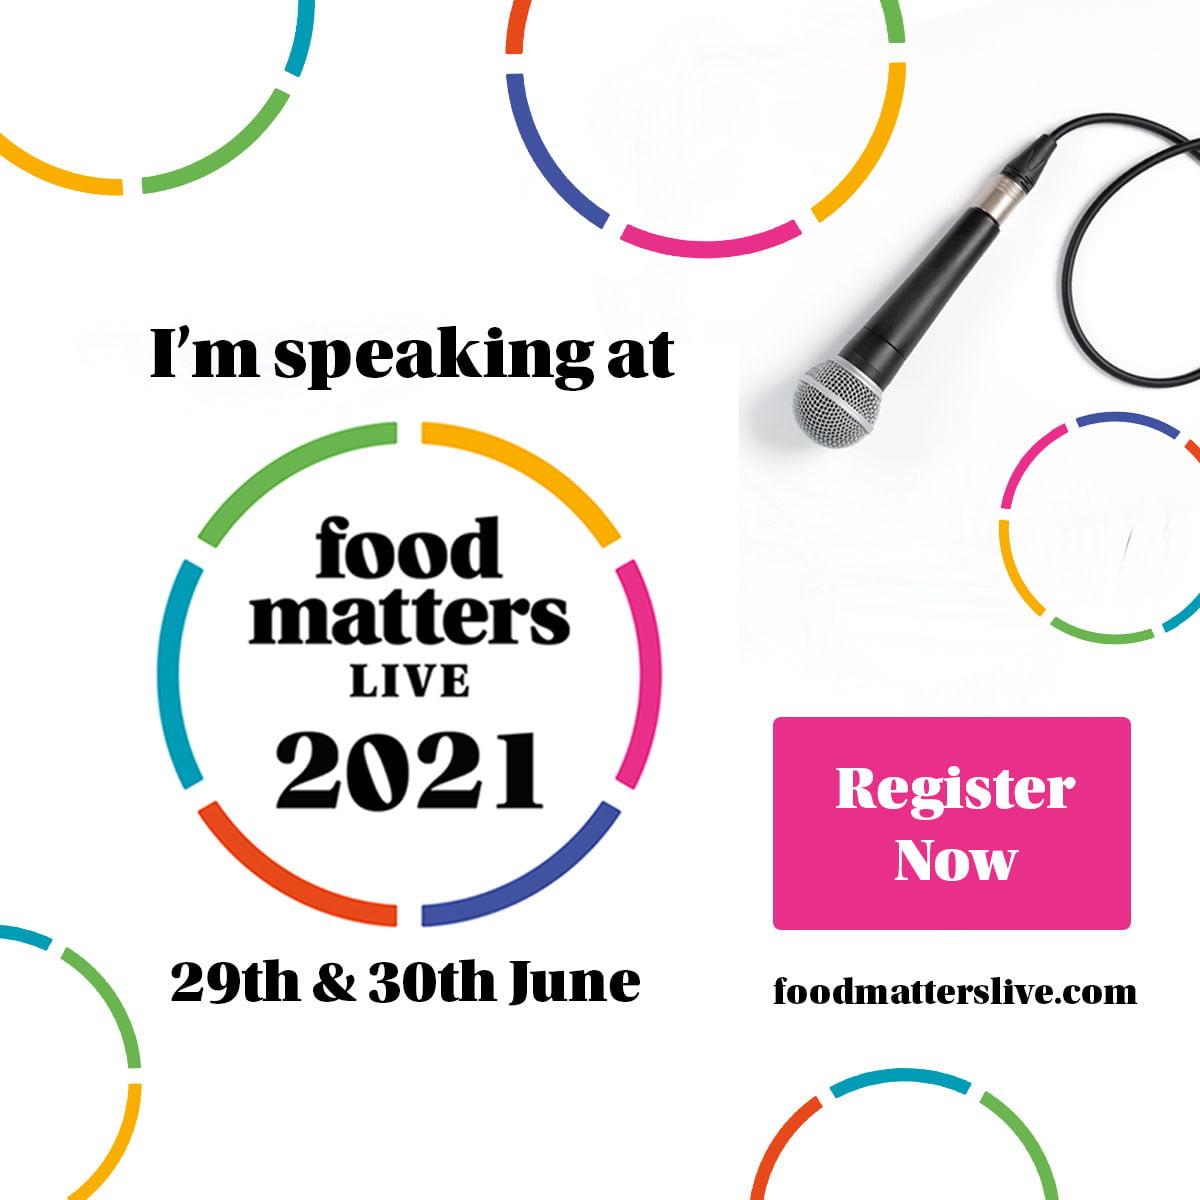 Food Matters Live Speaker - The Food Marketing Experts